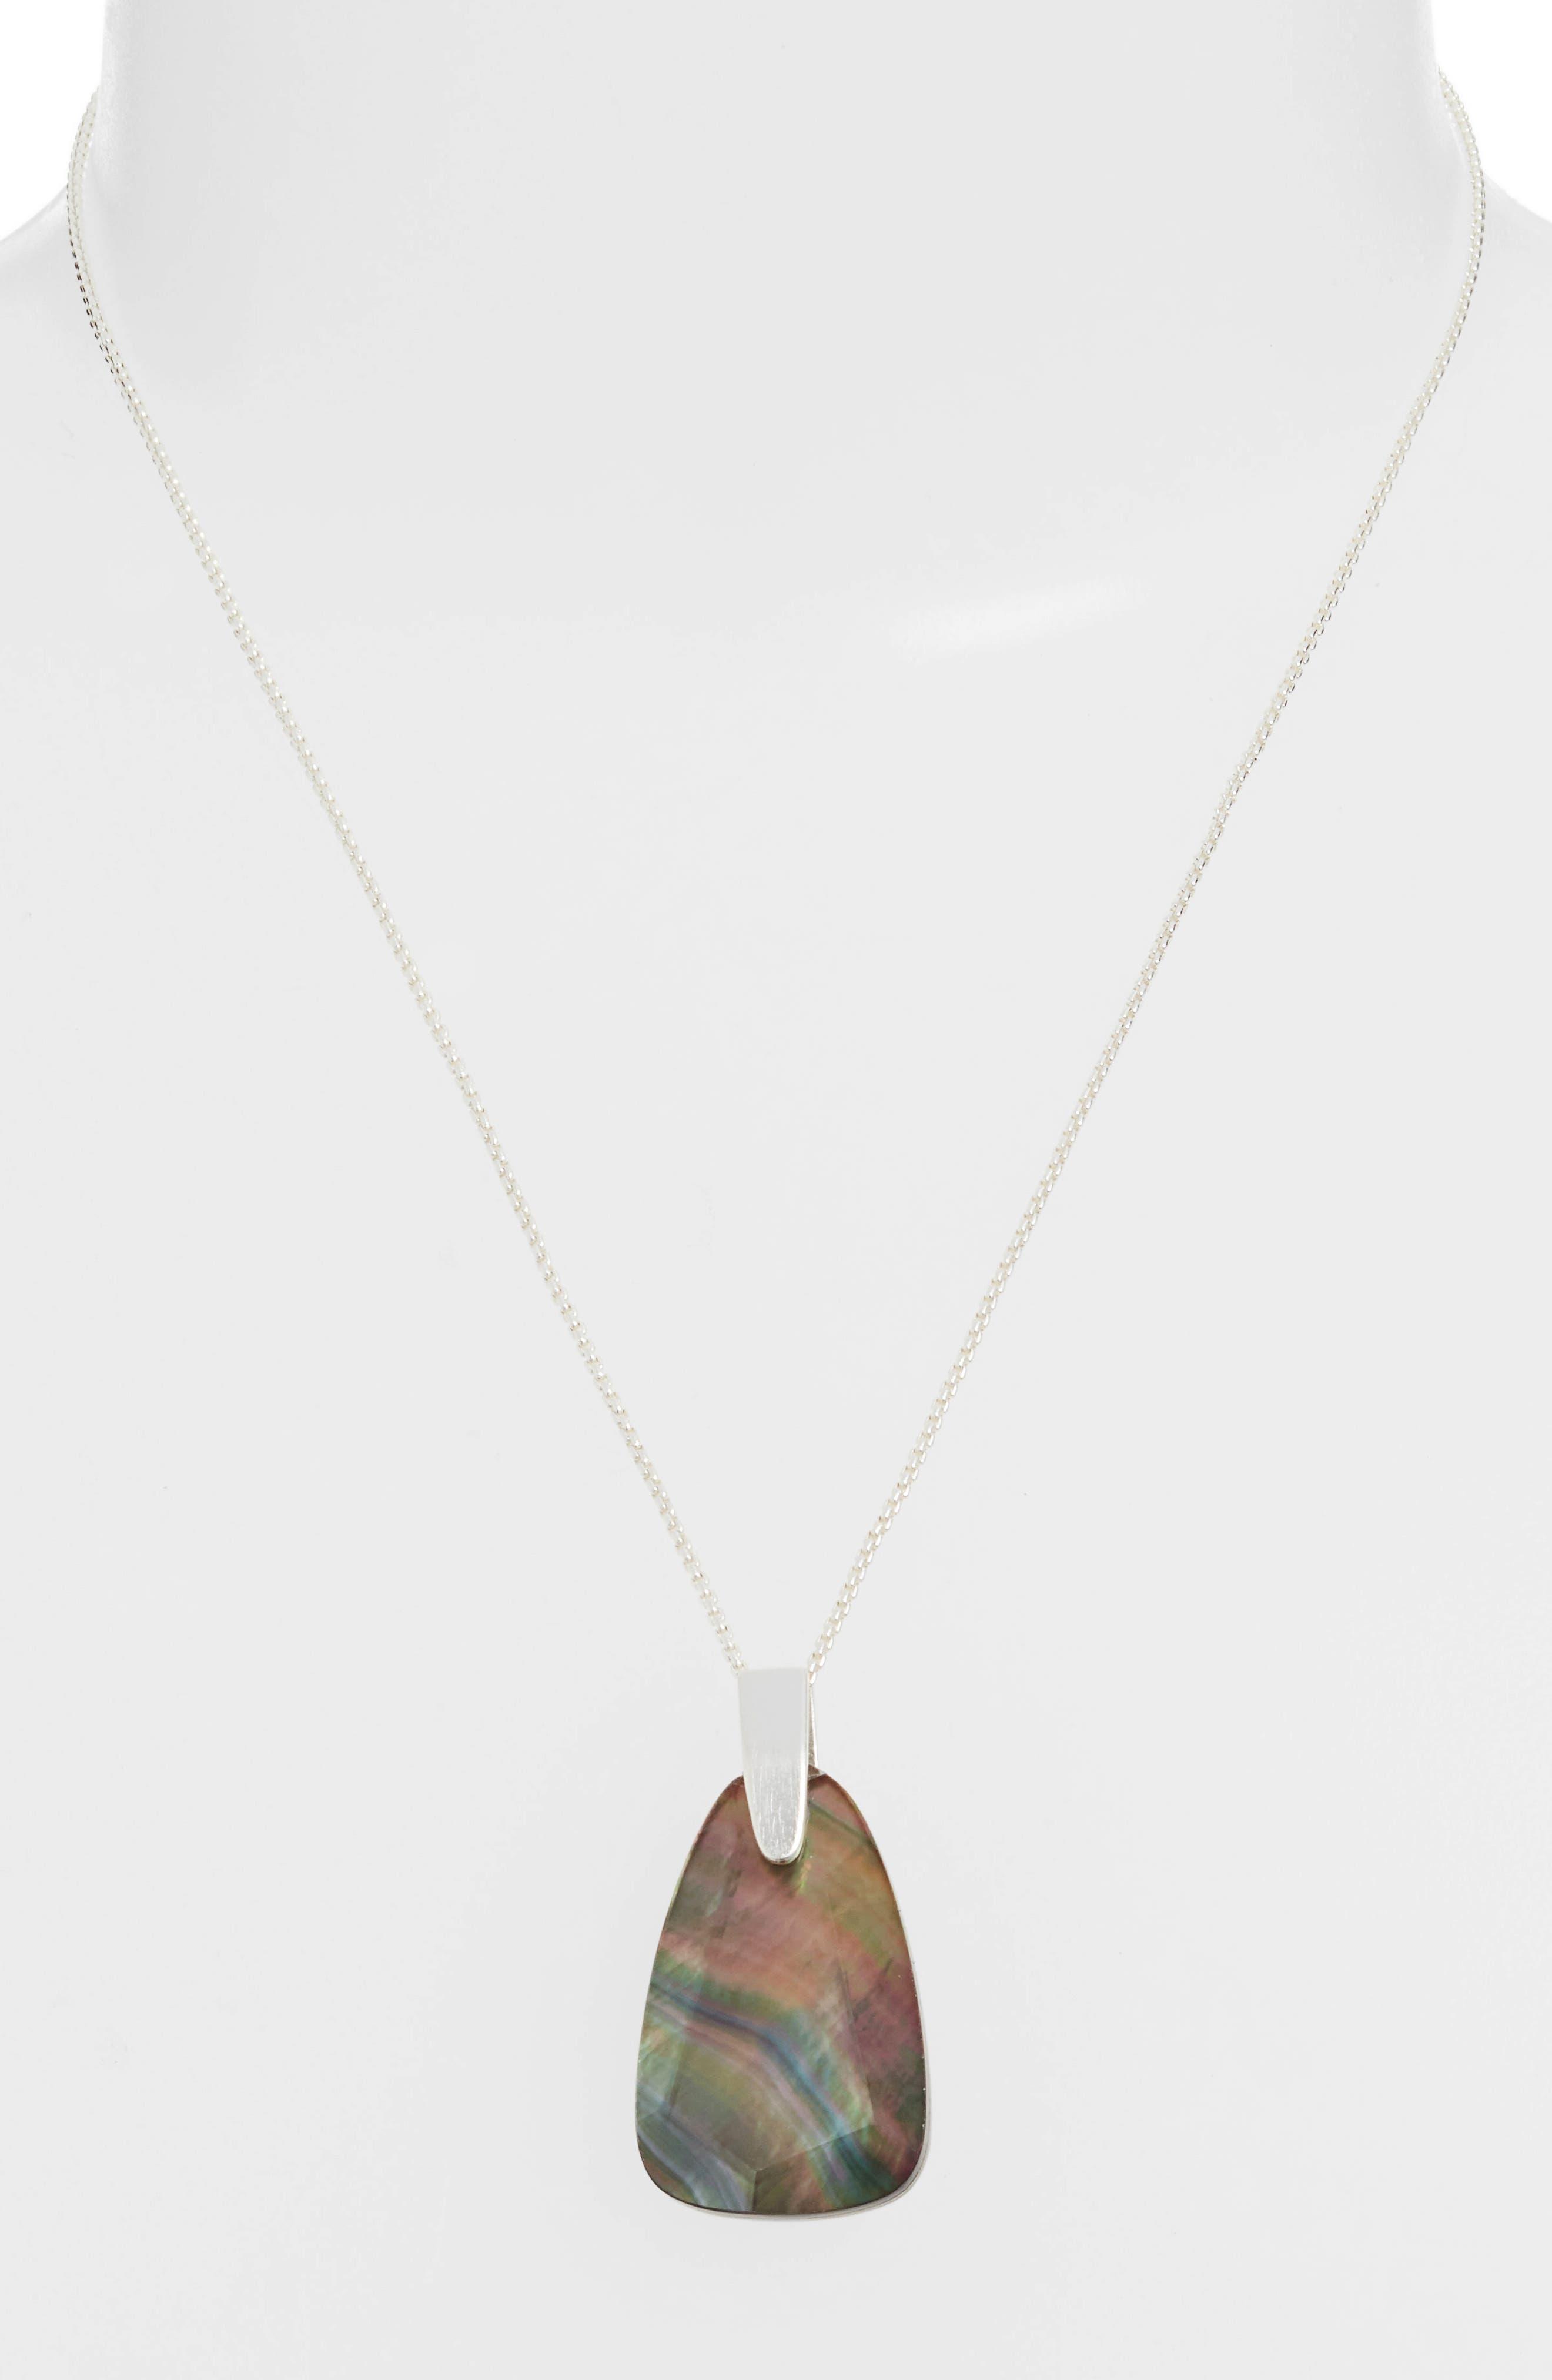 KENDRA SCOTT, Maeve Long Stone Pendant Necklace, Alternate thumbnail 2, color, BRIGHT SILVER/ BLACK MOP